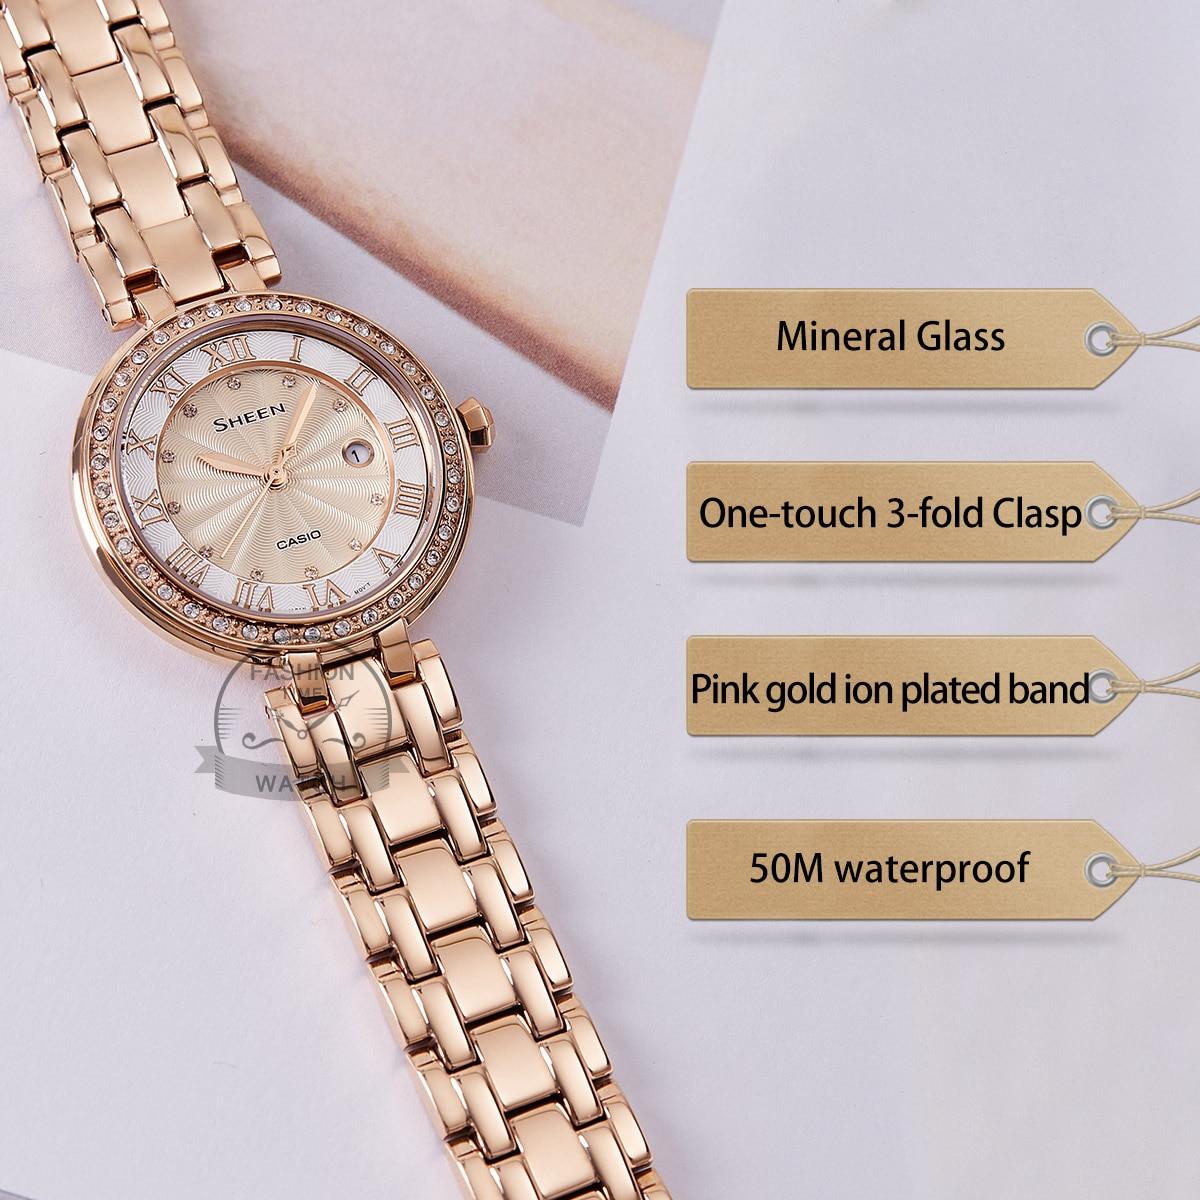 Casio watch Swarovski Crystal women watches top brand luxury set ladies watch women 50mWaterproof Quartz Sport clock reloj mujer enlarge